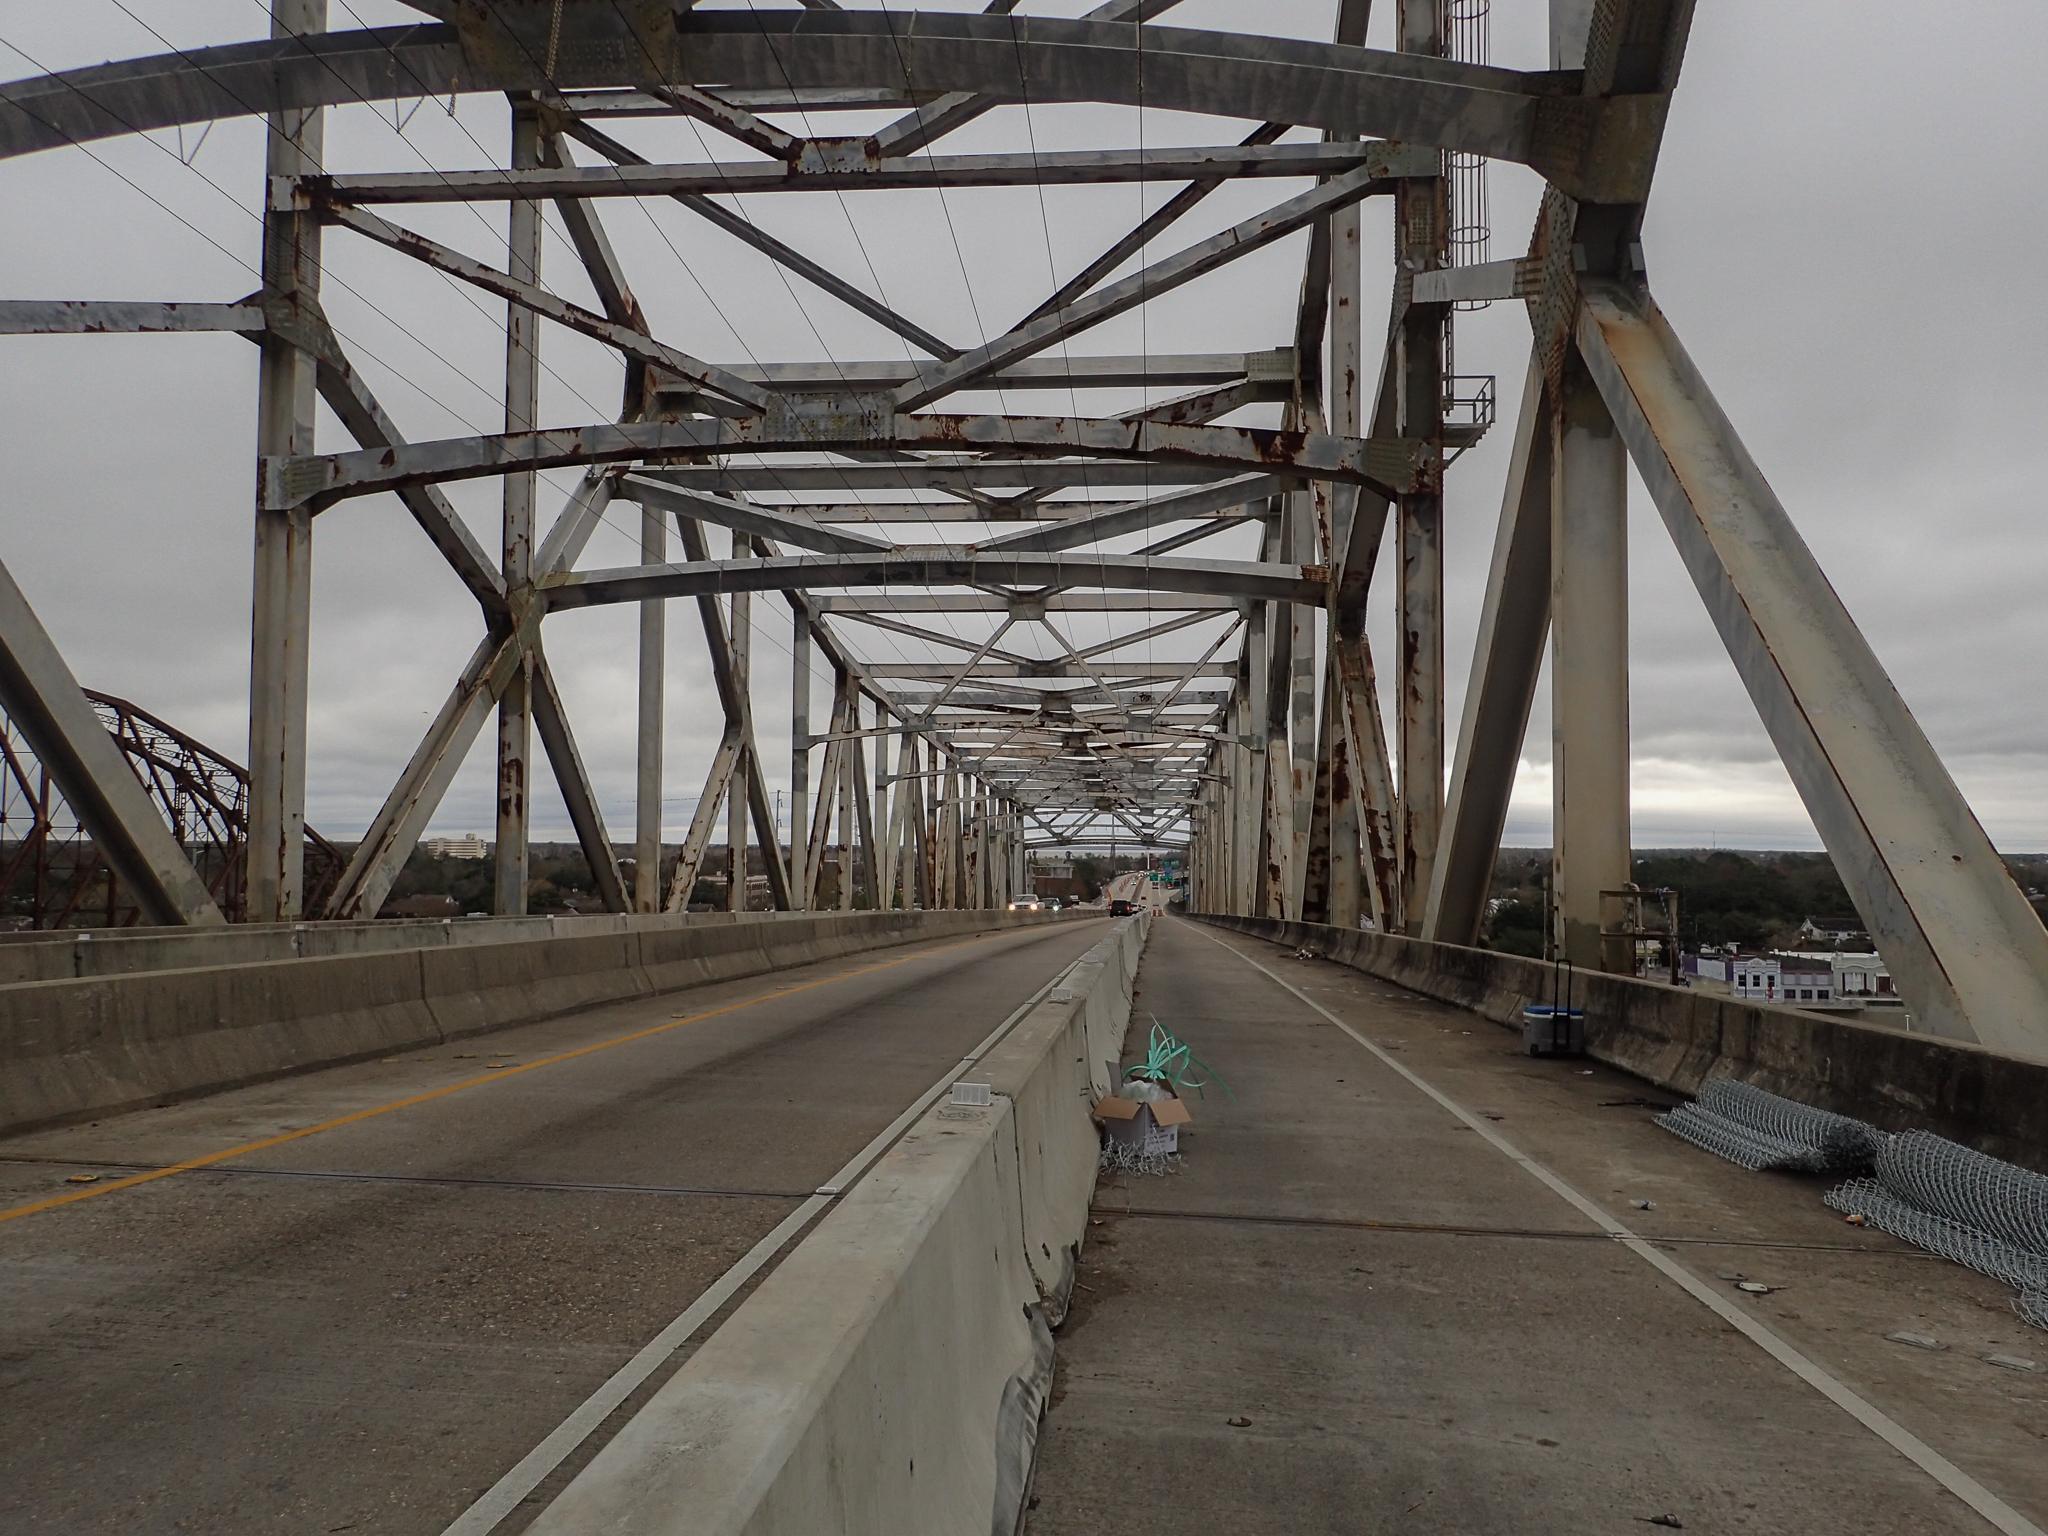 Clear path on the bridge